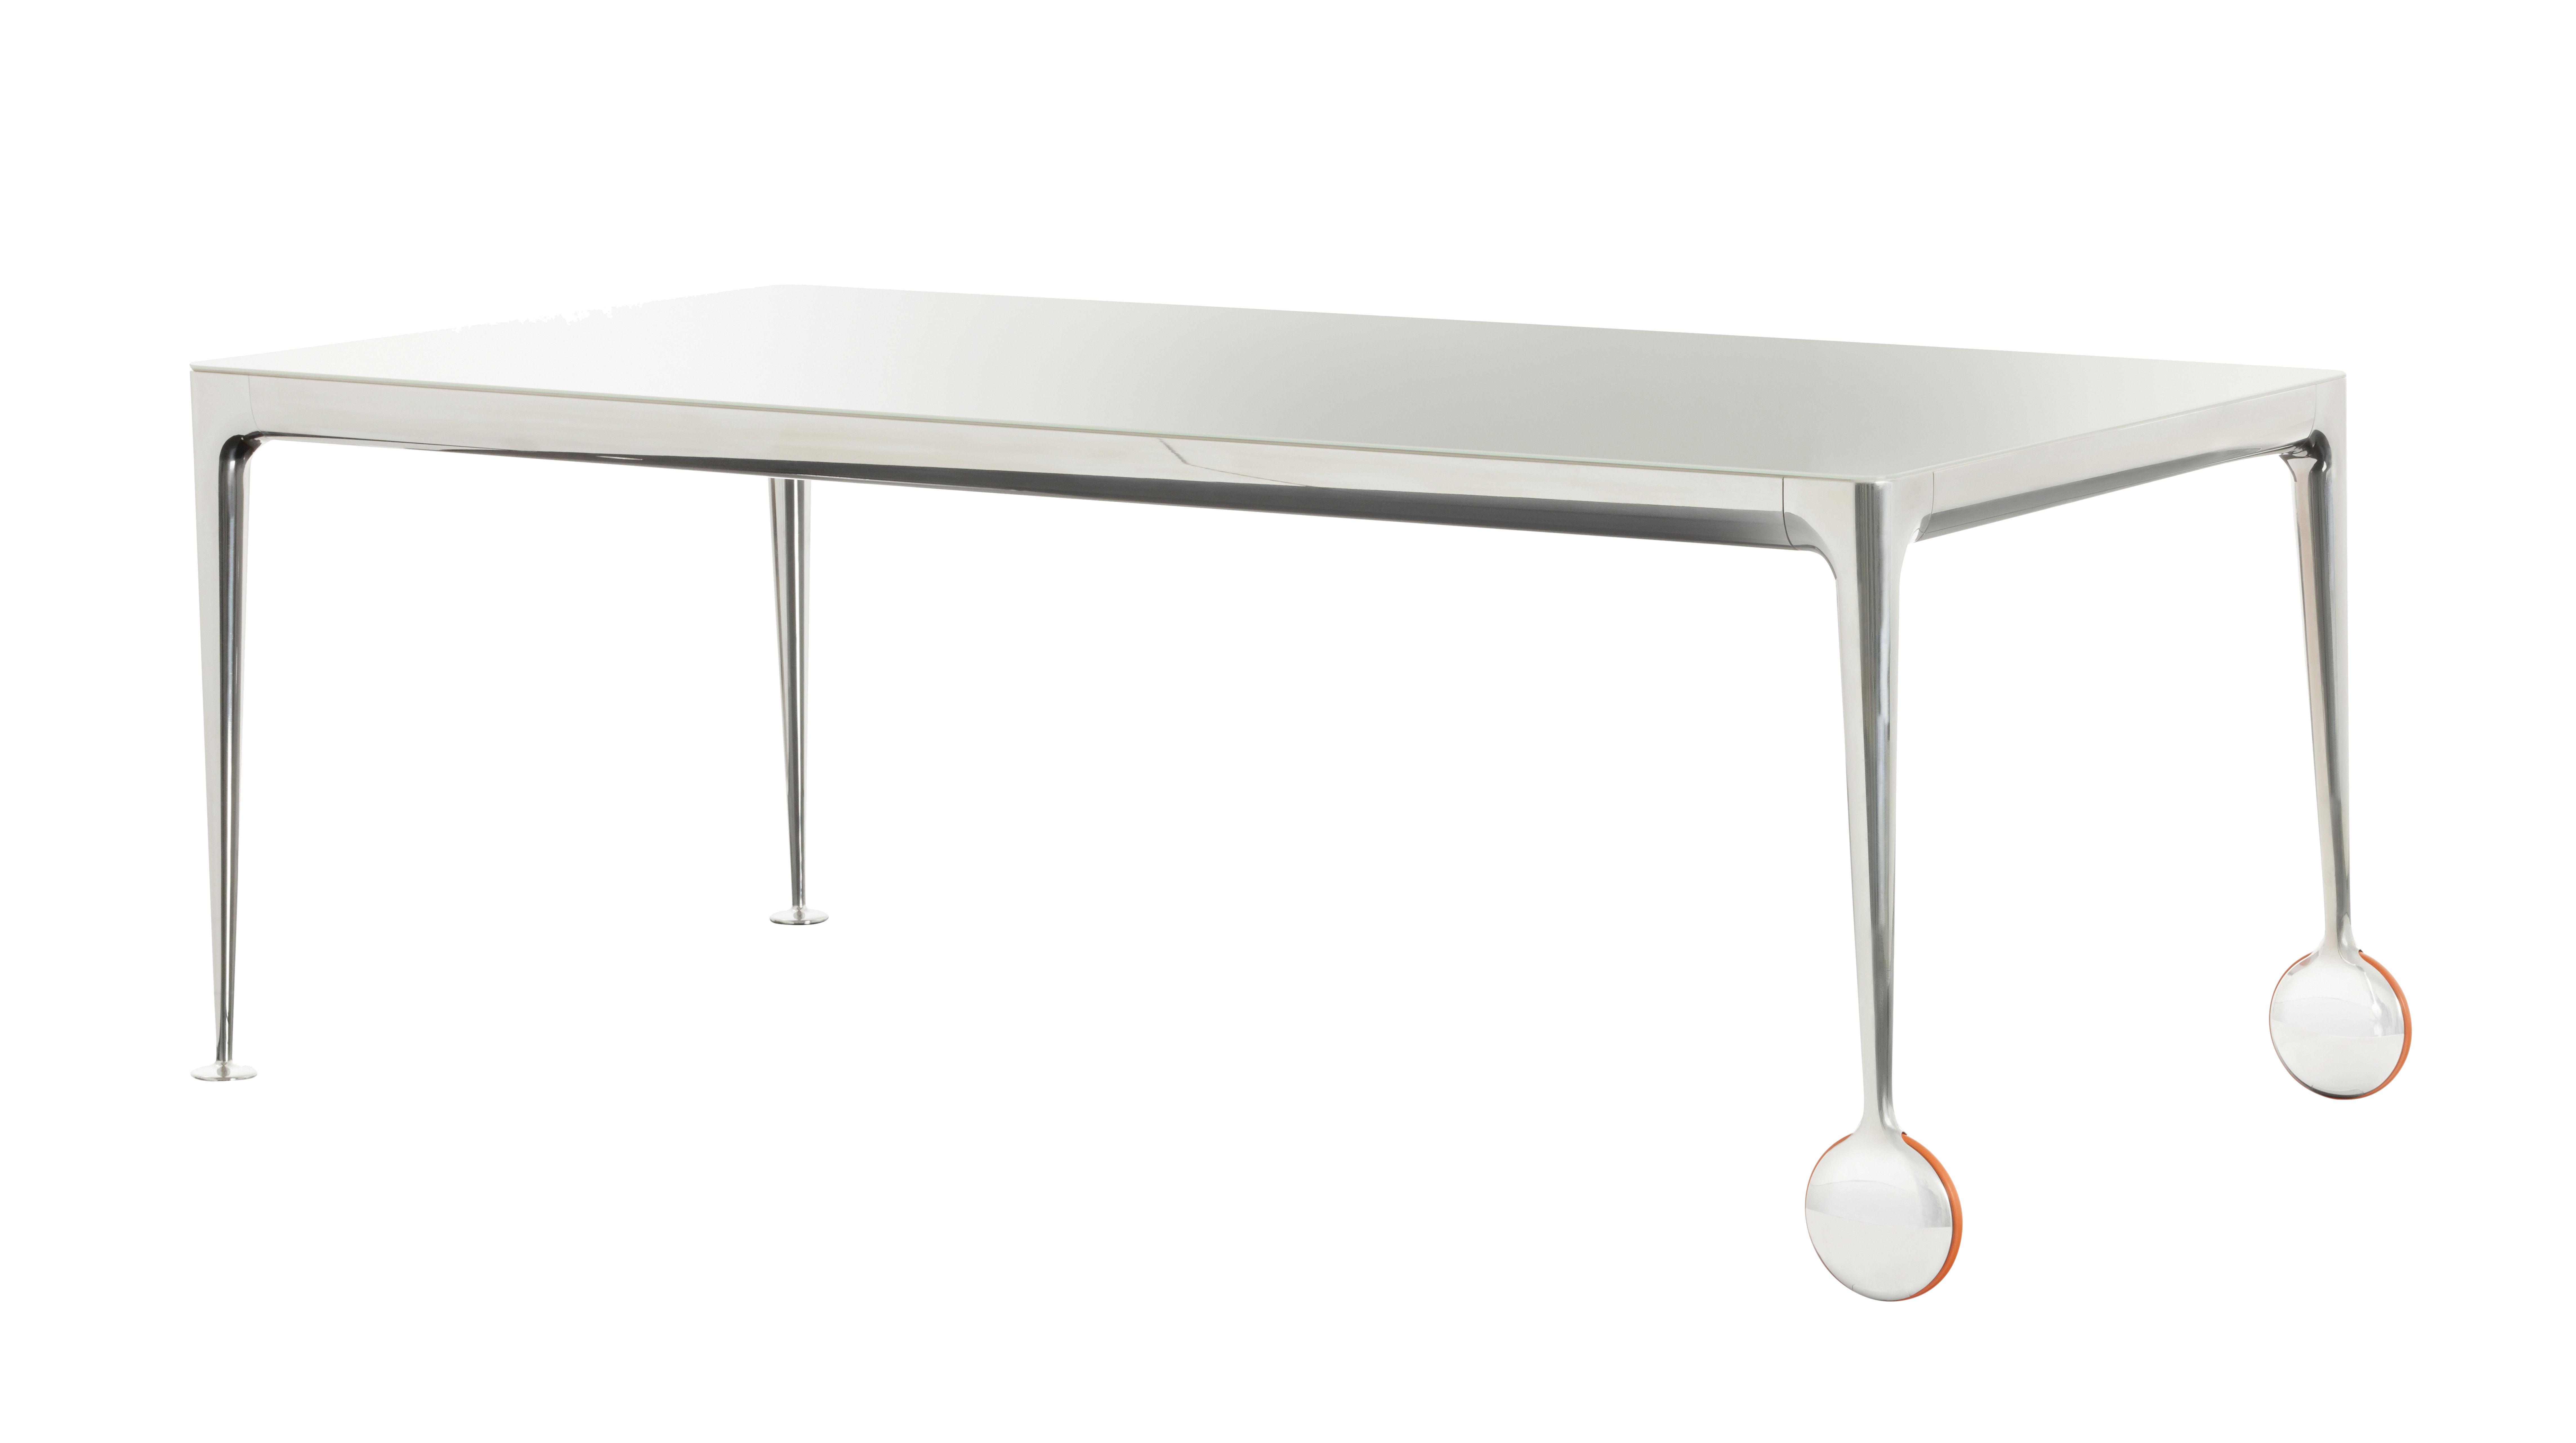 Dossiers - Top 100 - Table Big Will / 200 x 100 cm - Magis - Plateau blanc brillant / Pieds alu poli - Caoutchouc, Fonte d'aluminium poli, Verre trempé